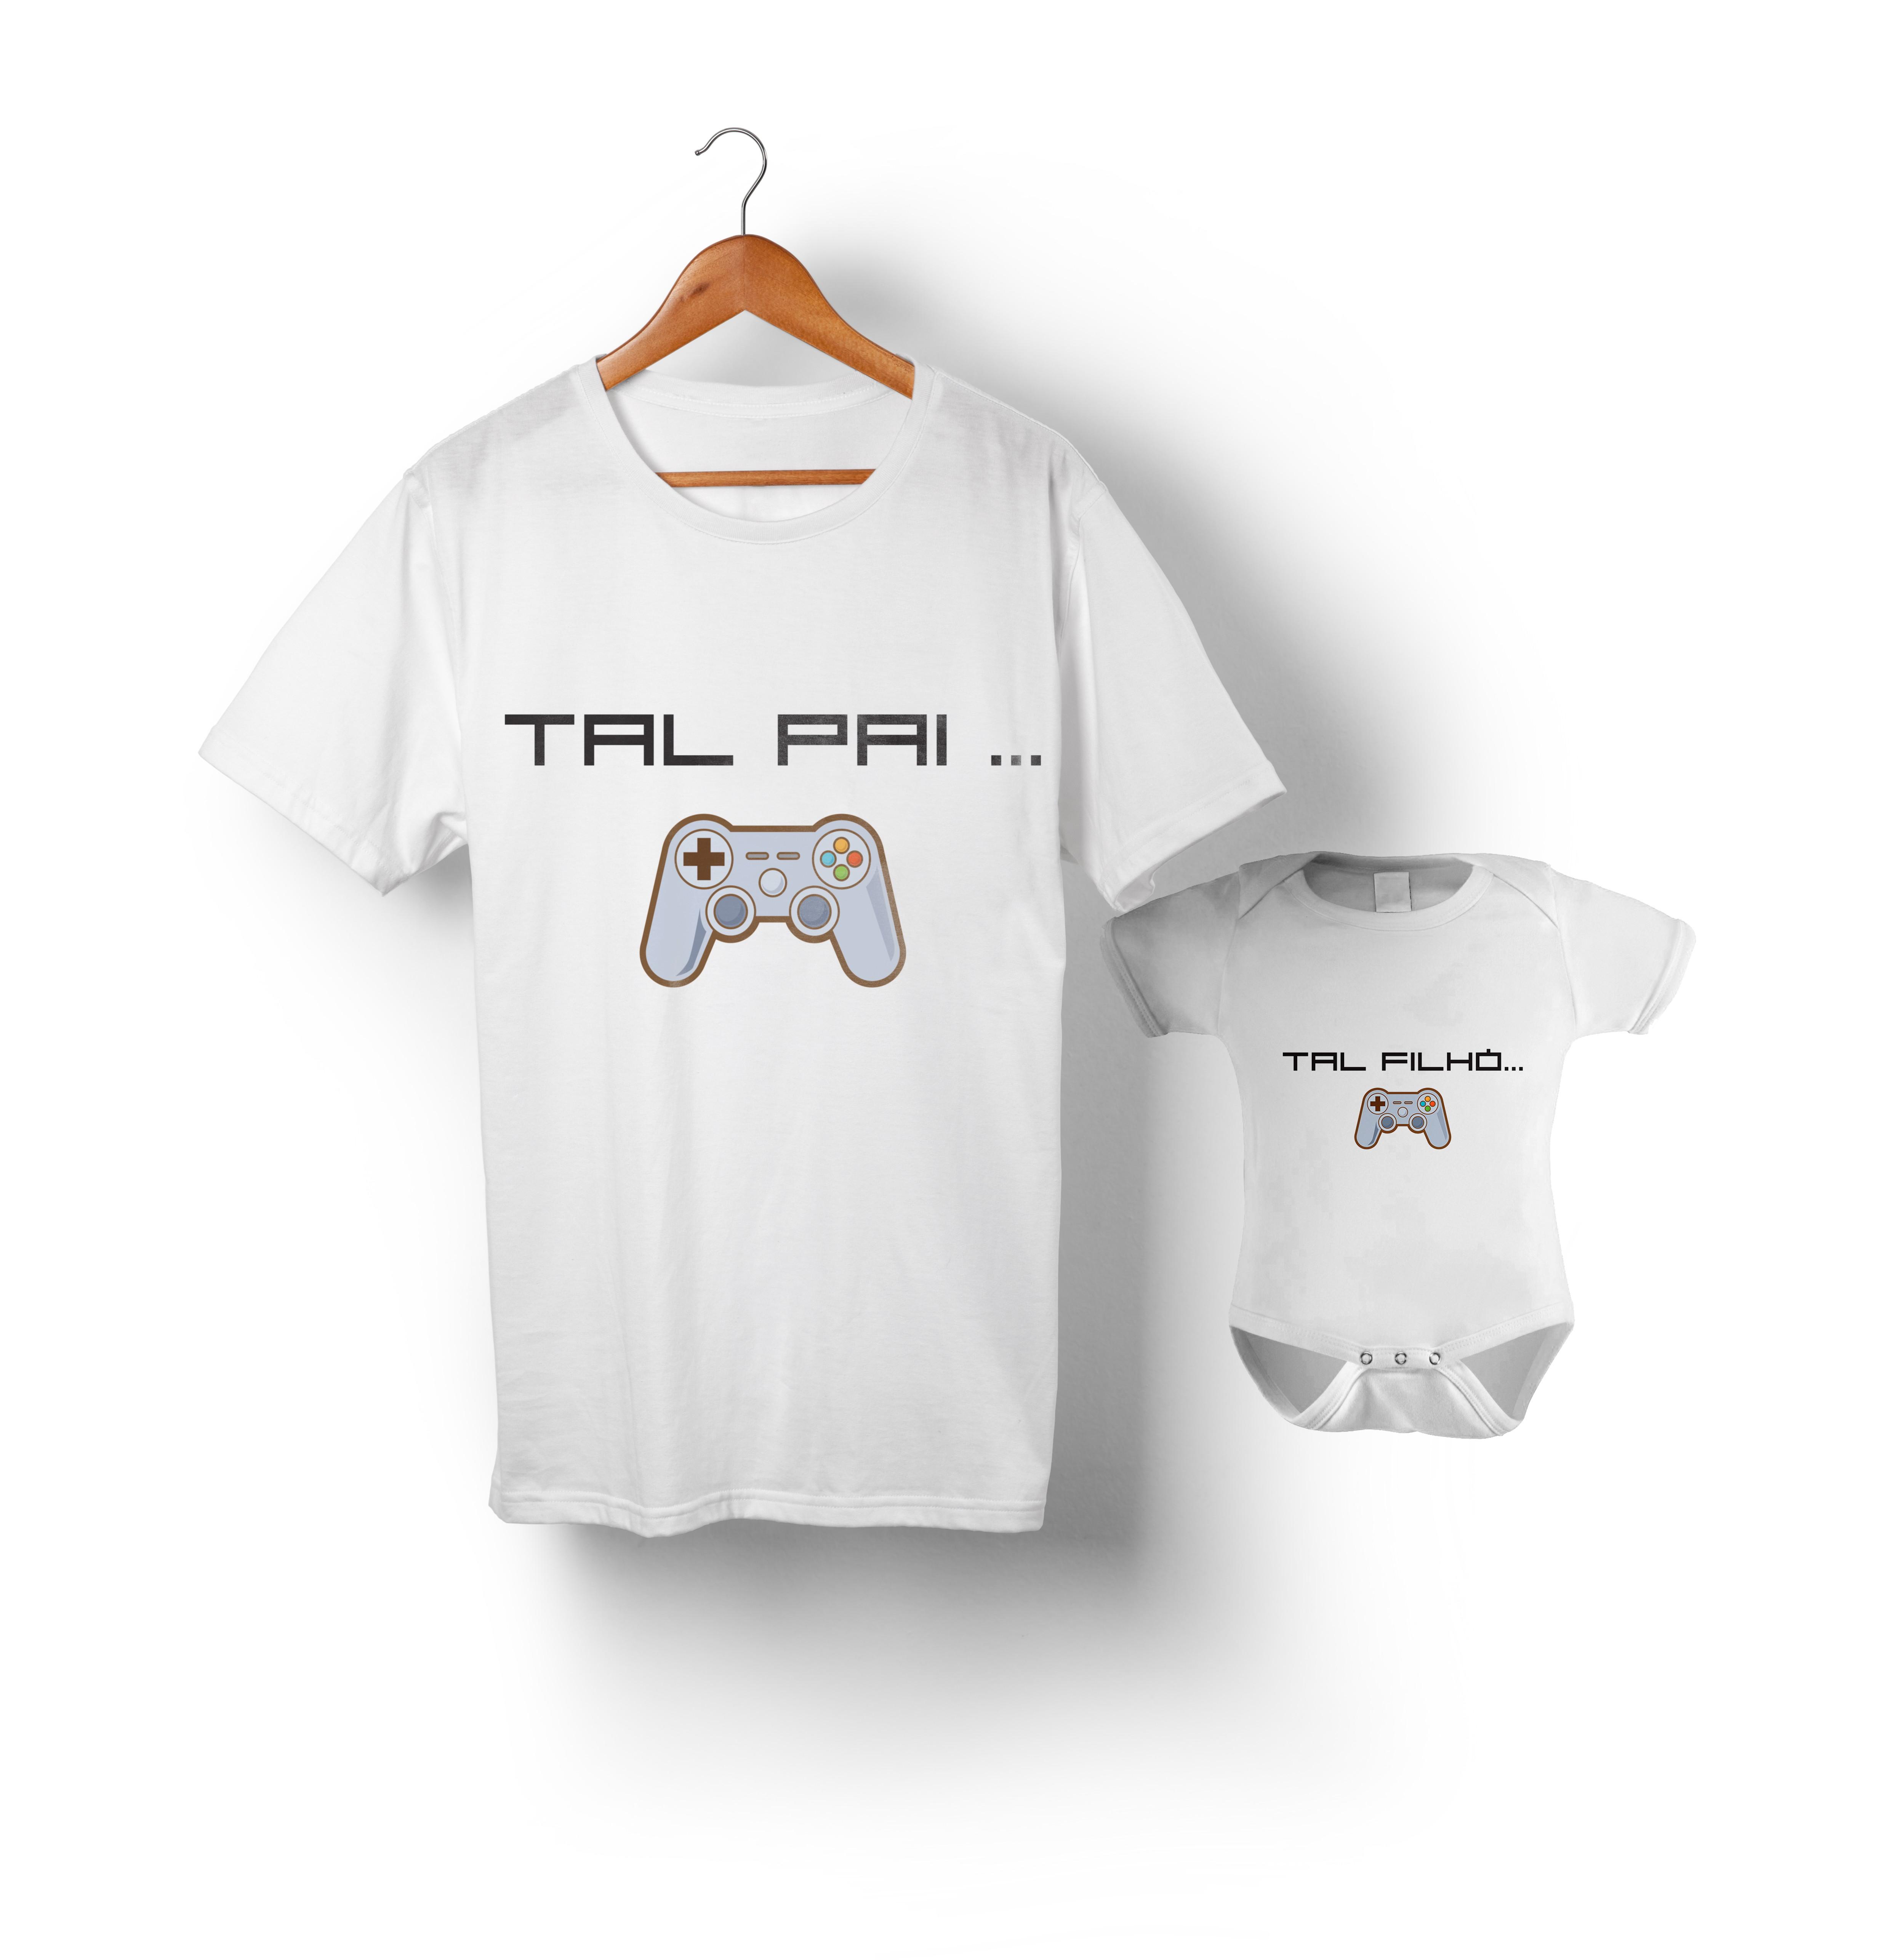 e9f1b1fe1dce3 Camiseta Personalizada Tal Pai e Tal Filho - Pai da Galáxia no Elo7 |  Fabricaria (E51F8E)